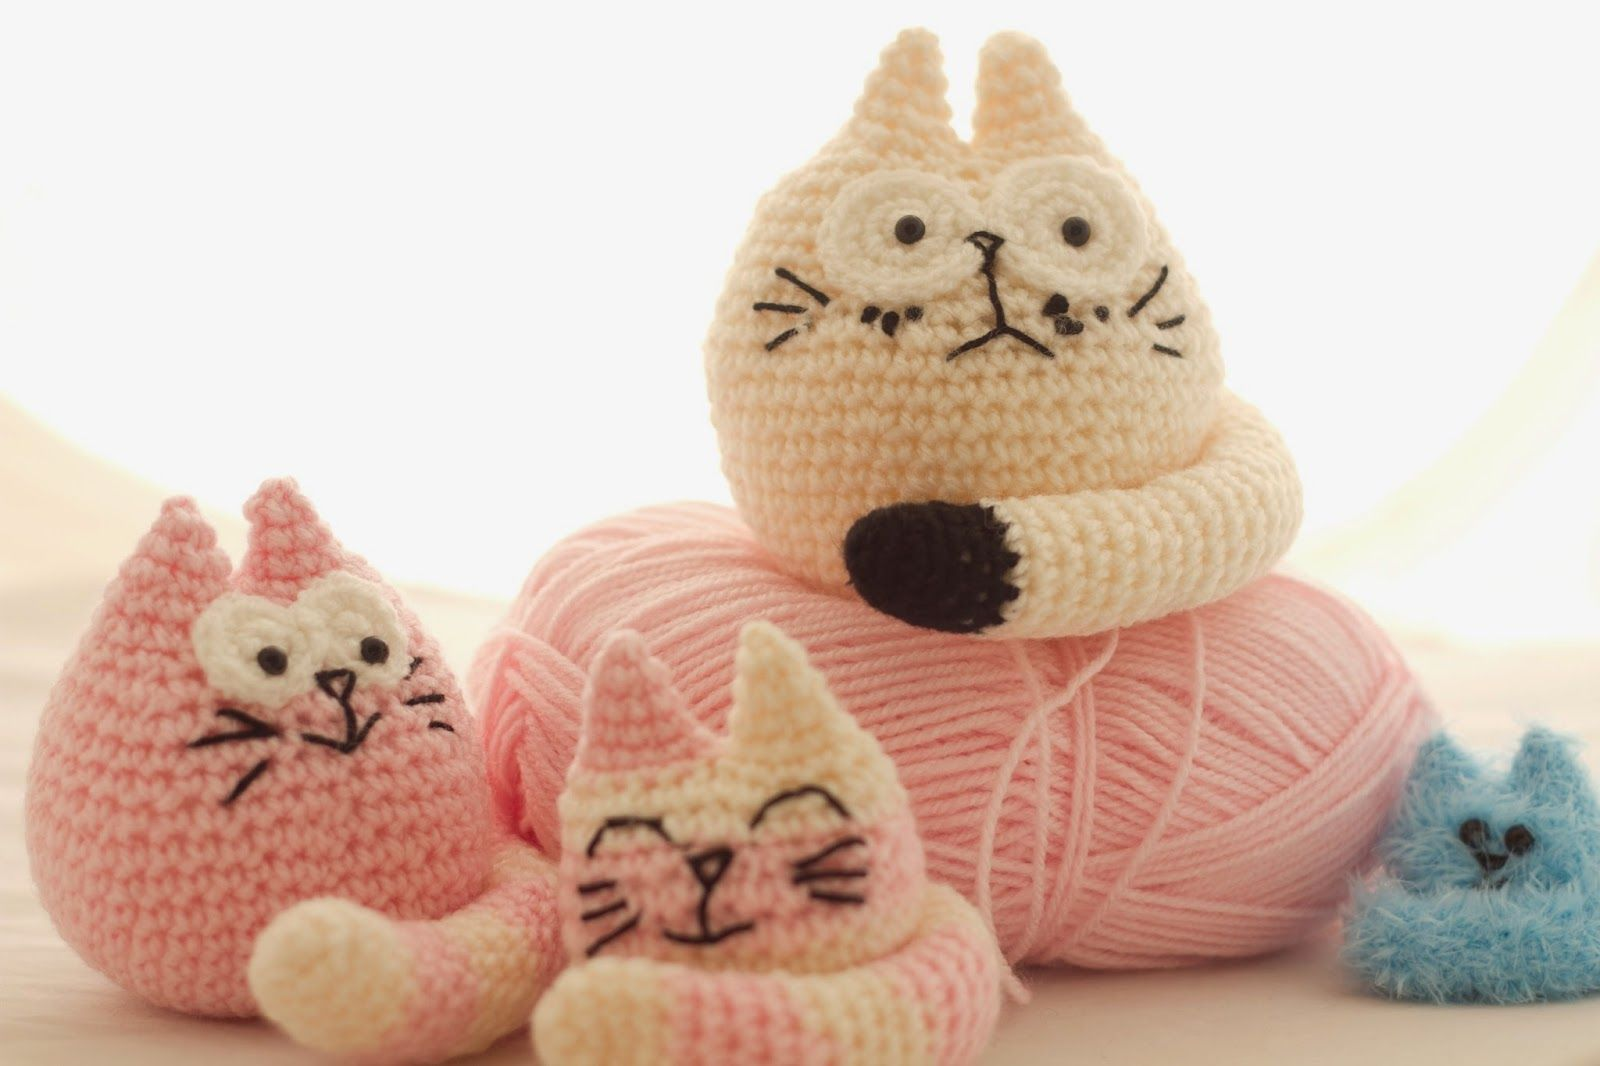 Fugly Crochet: Free Fat Cat Crochet Pattern!! New site the ...